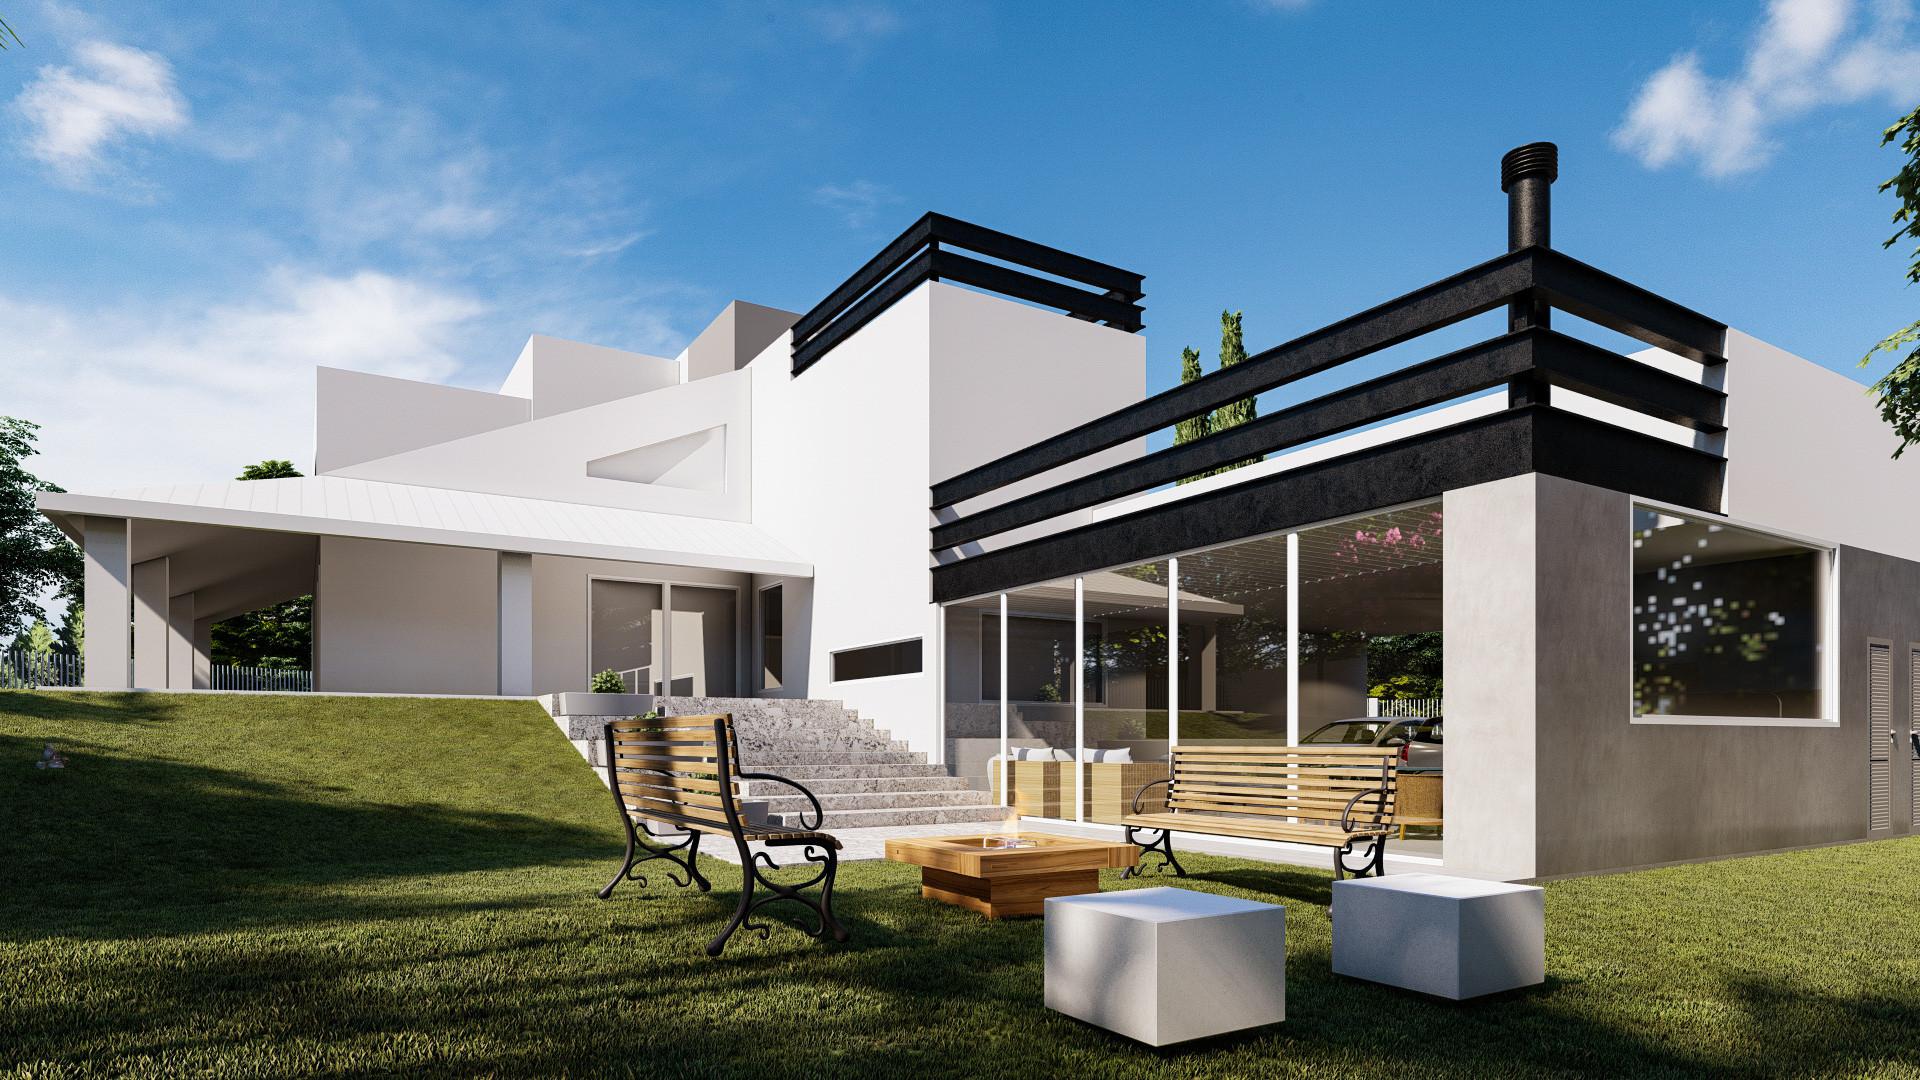 leve_casa novak - numen arquitetura (20)